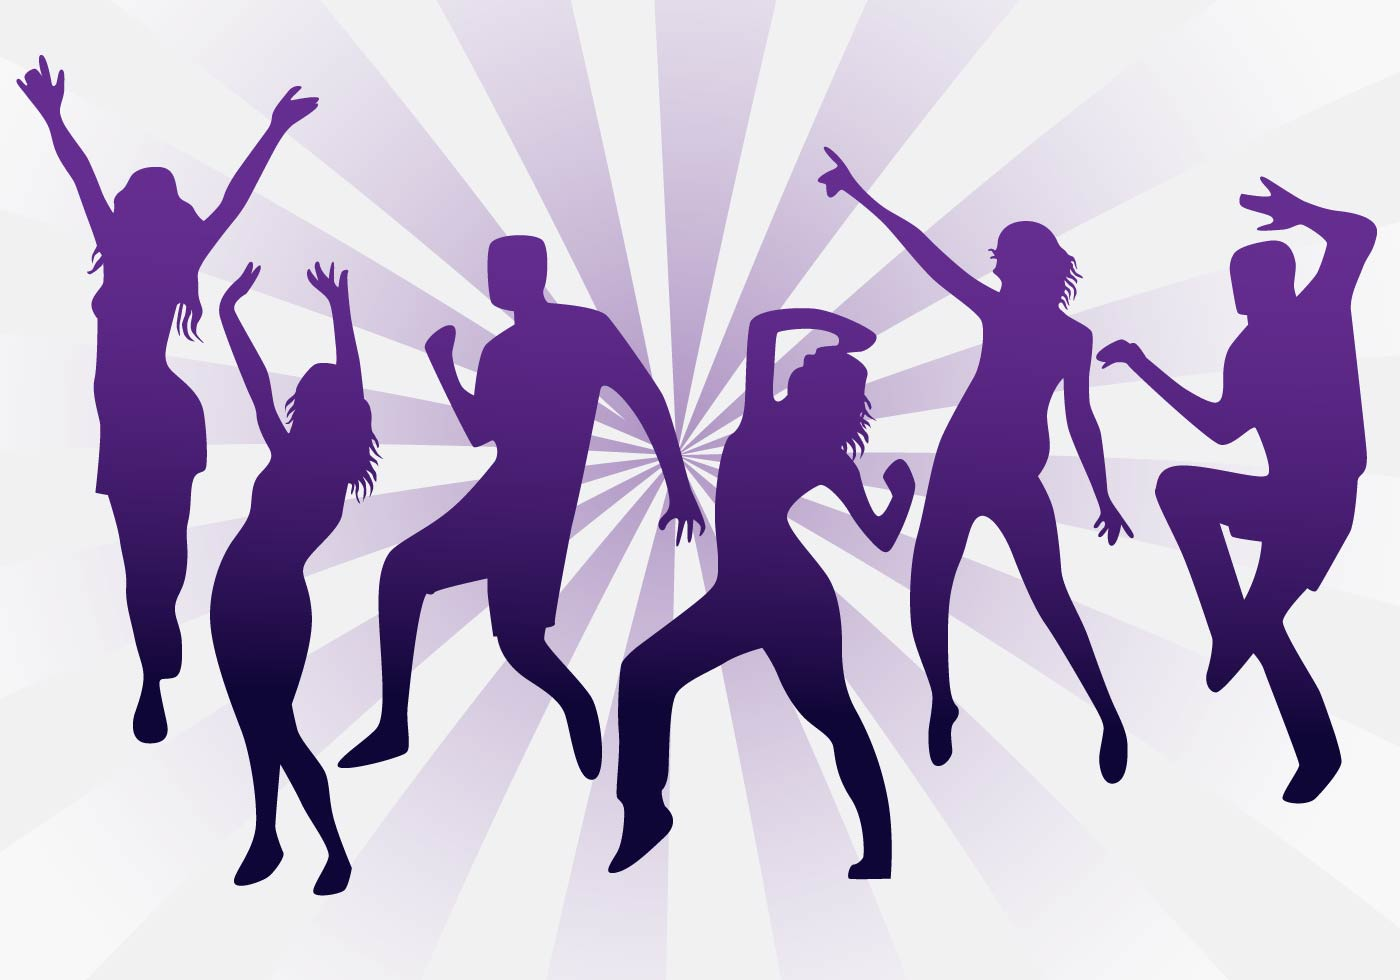 Clip art image of zumba dance jpg.